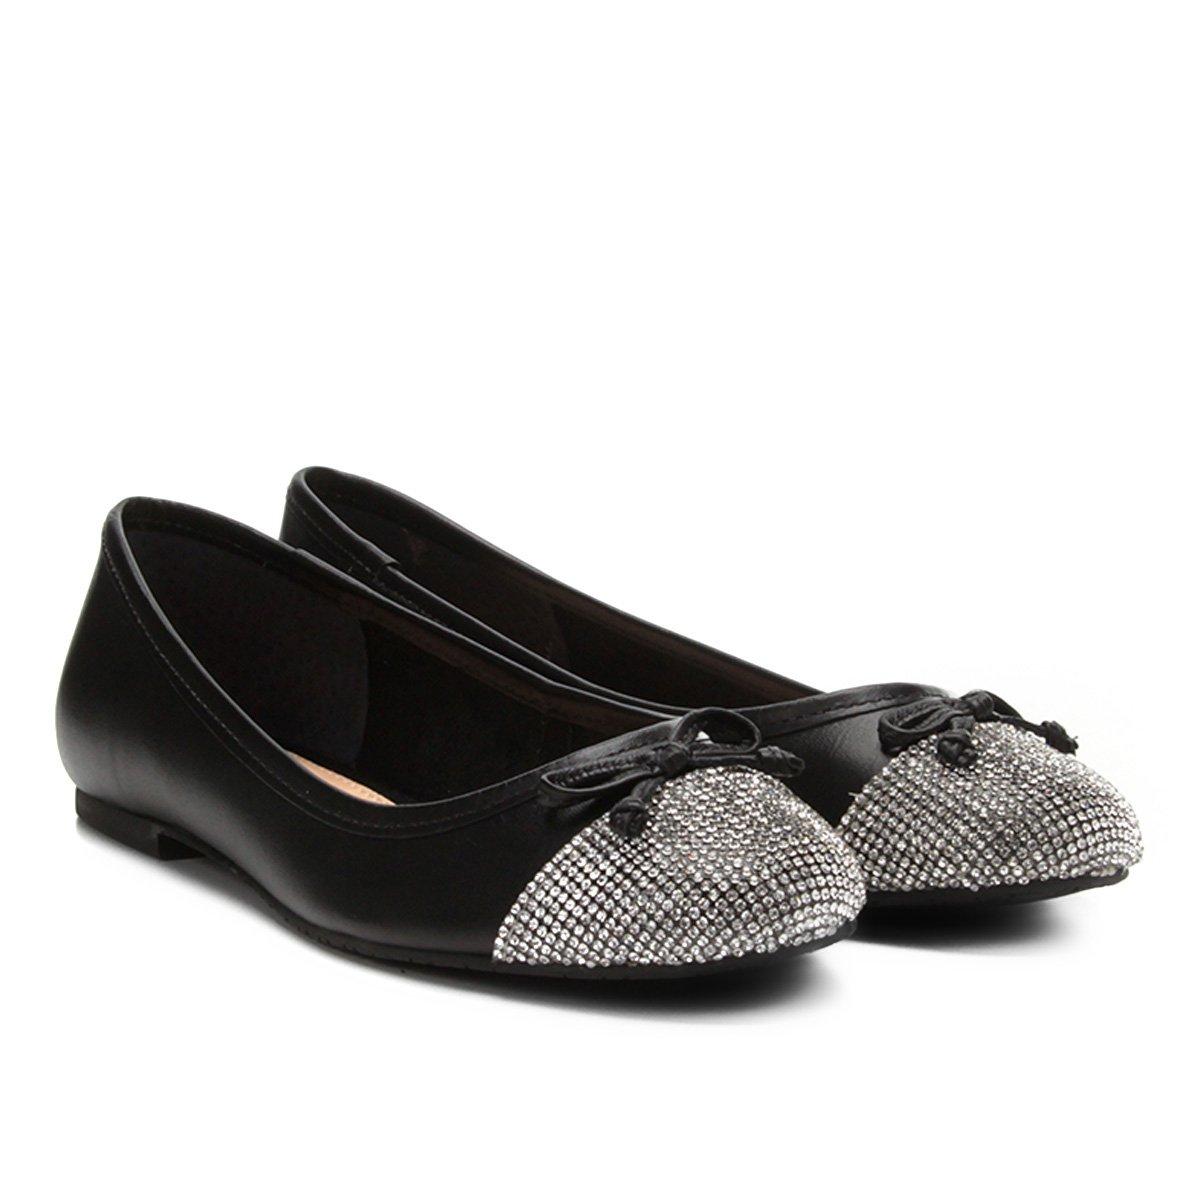 Cristal Feminina Prata Sapatilha Shoestock Couro Preto Sapatilha Couro e v8IIxXz